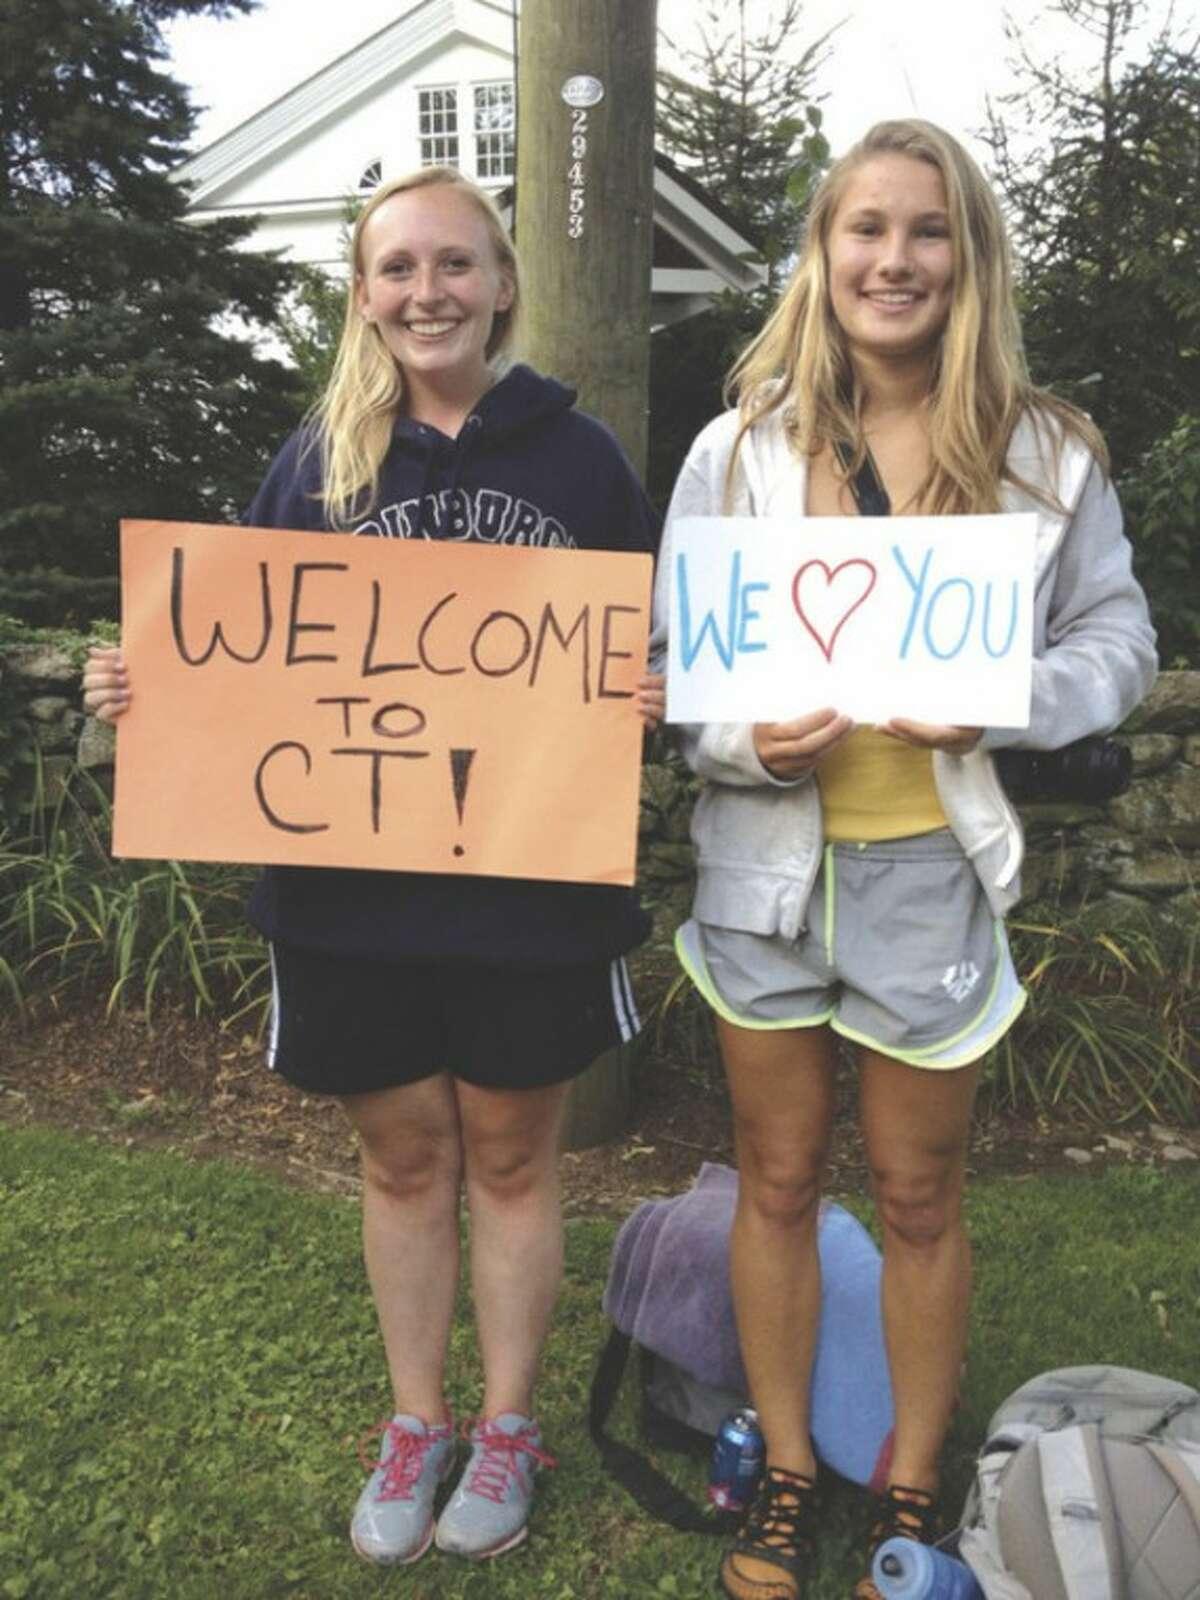 Hour photo / Robin Kaminski From left, Anna Burns and Annika Heumann, both of Fairfield, welcome President Obama to Conn.